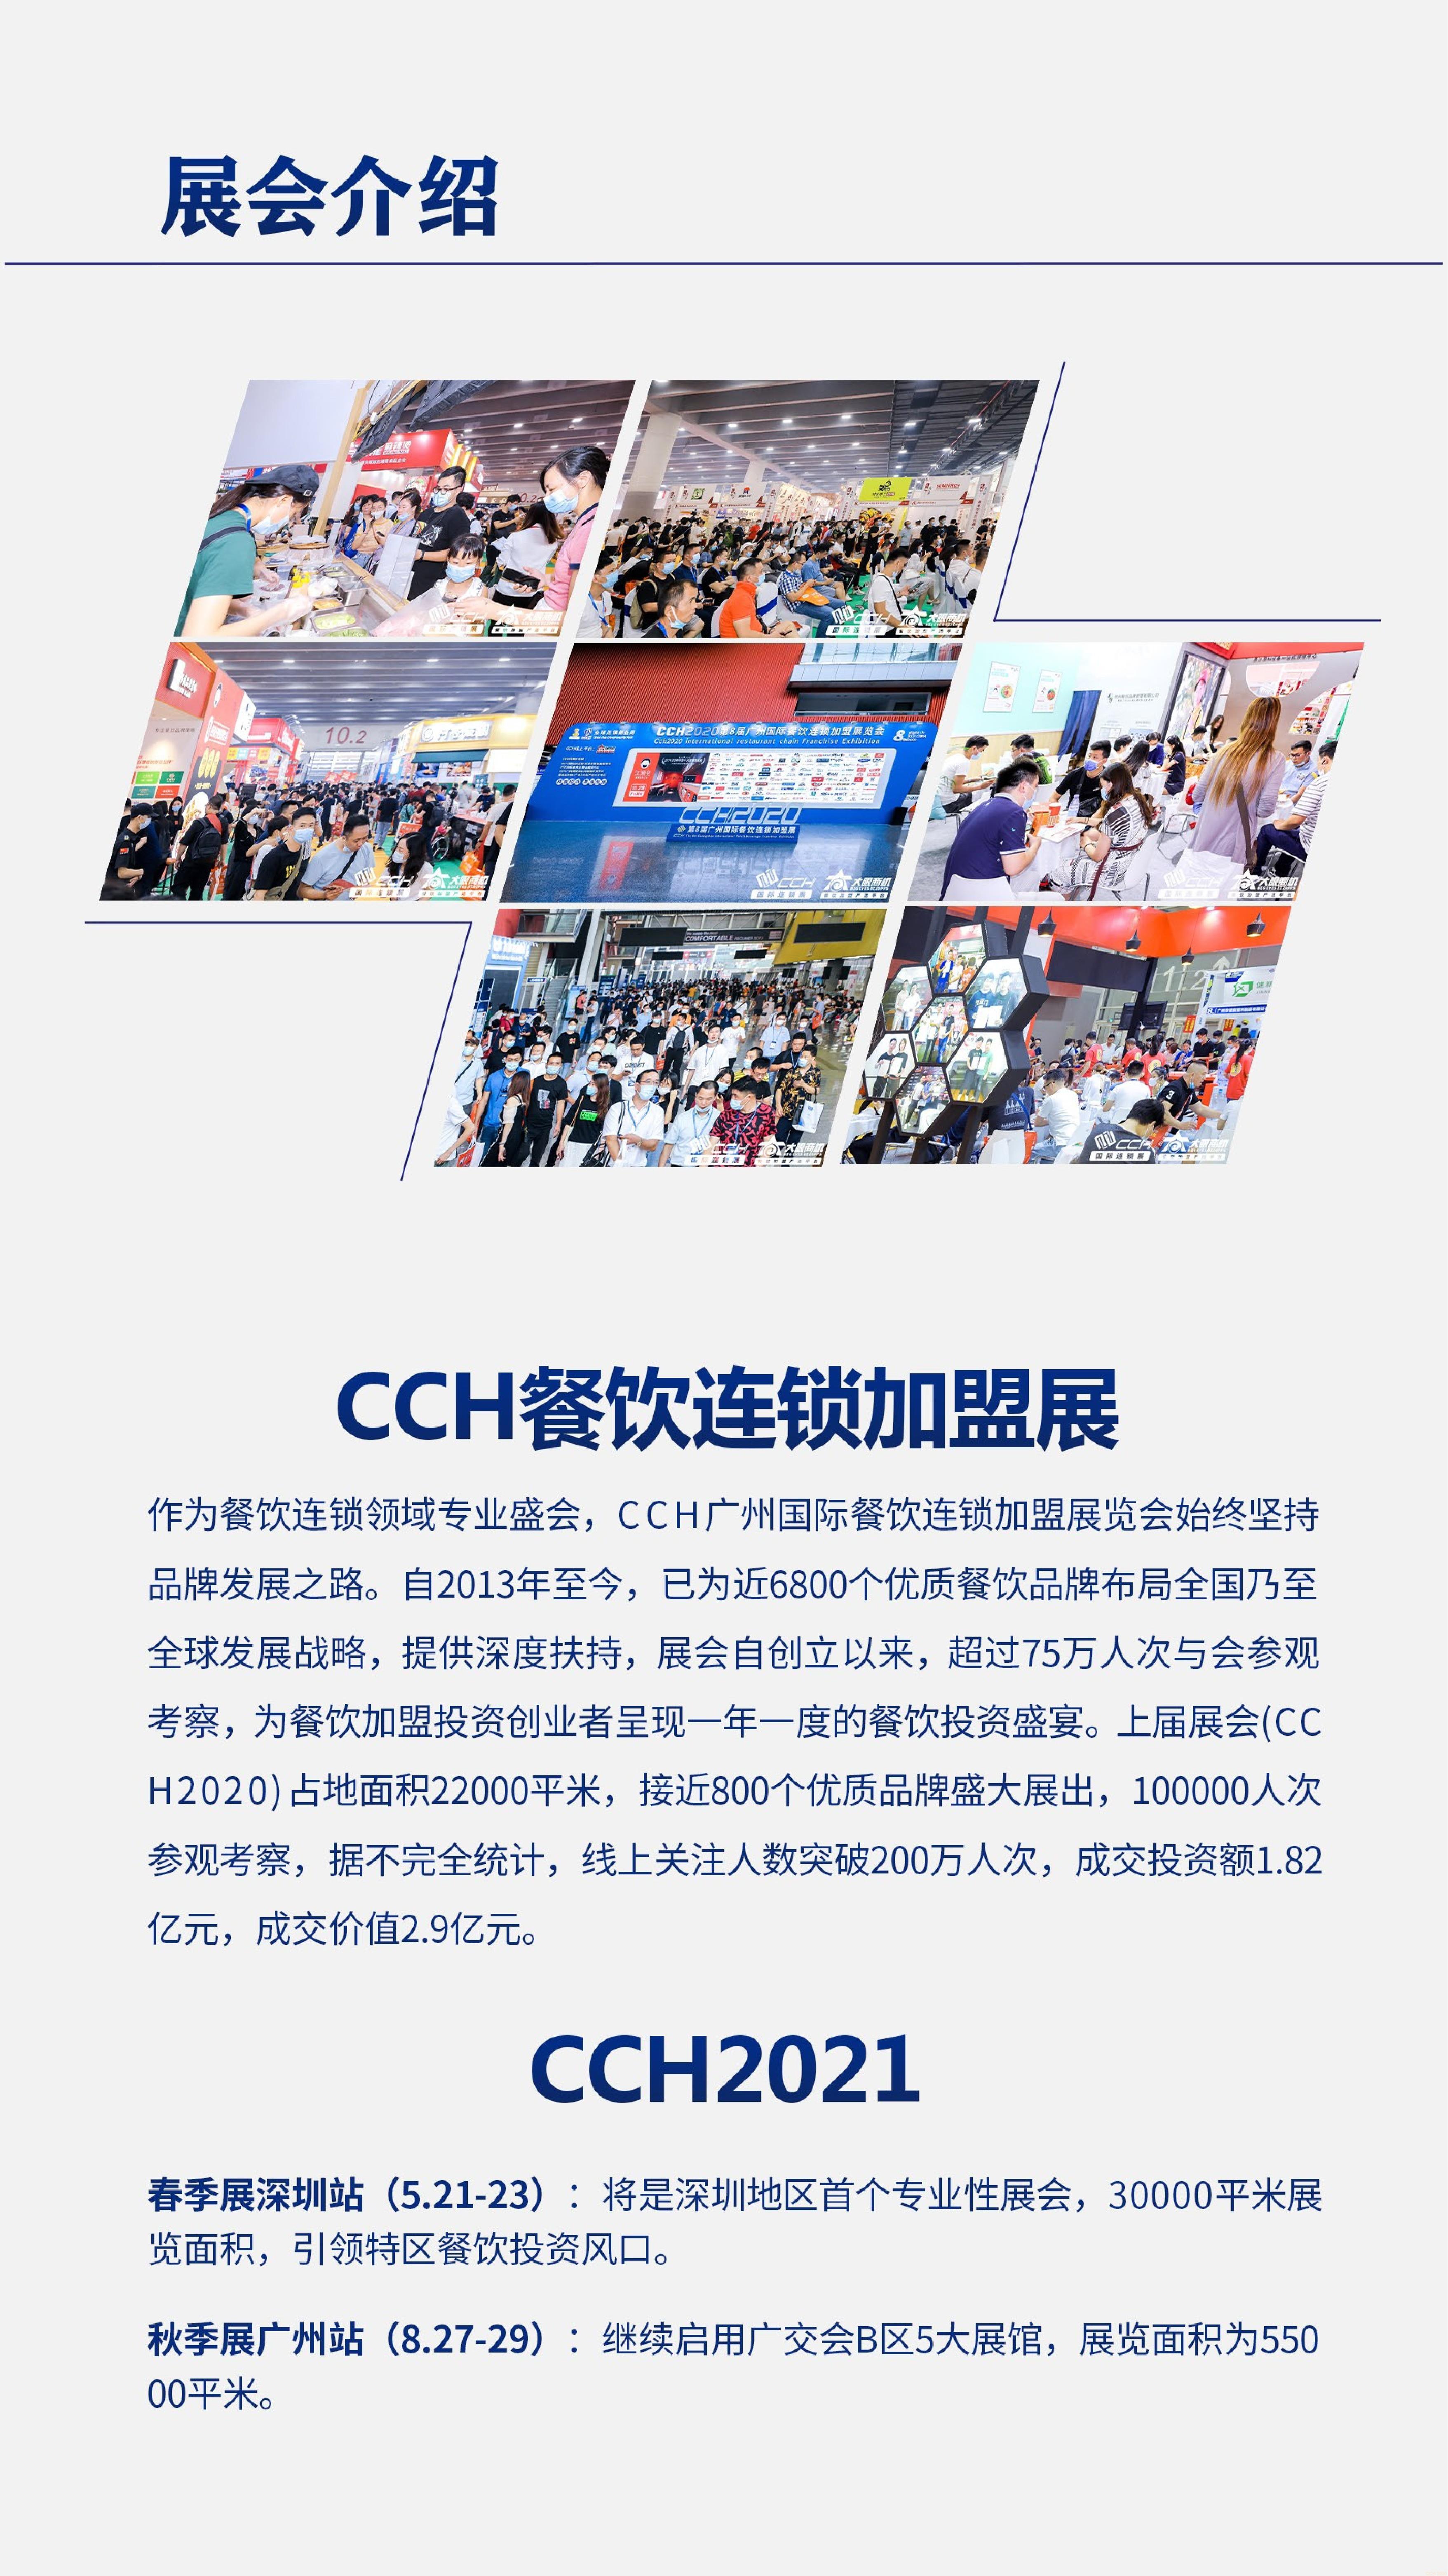 CCH2021-餐饮邀请函·赵(2)(1)-002.jpg